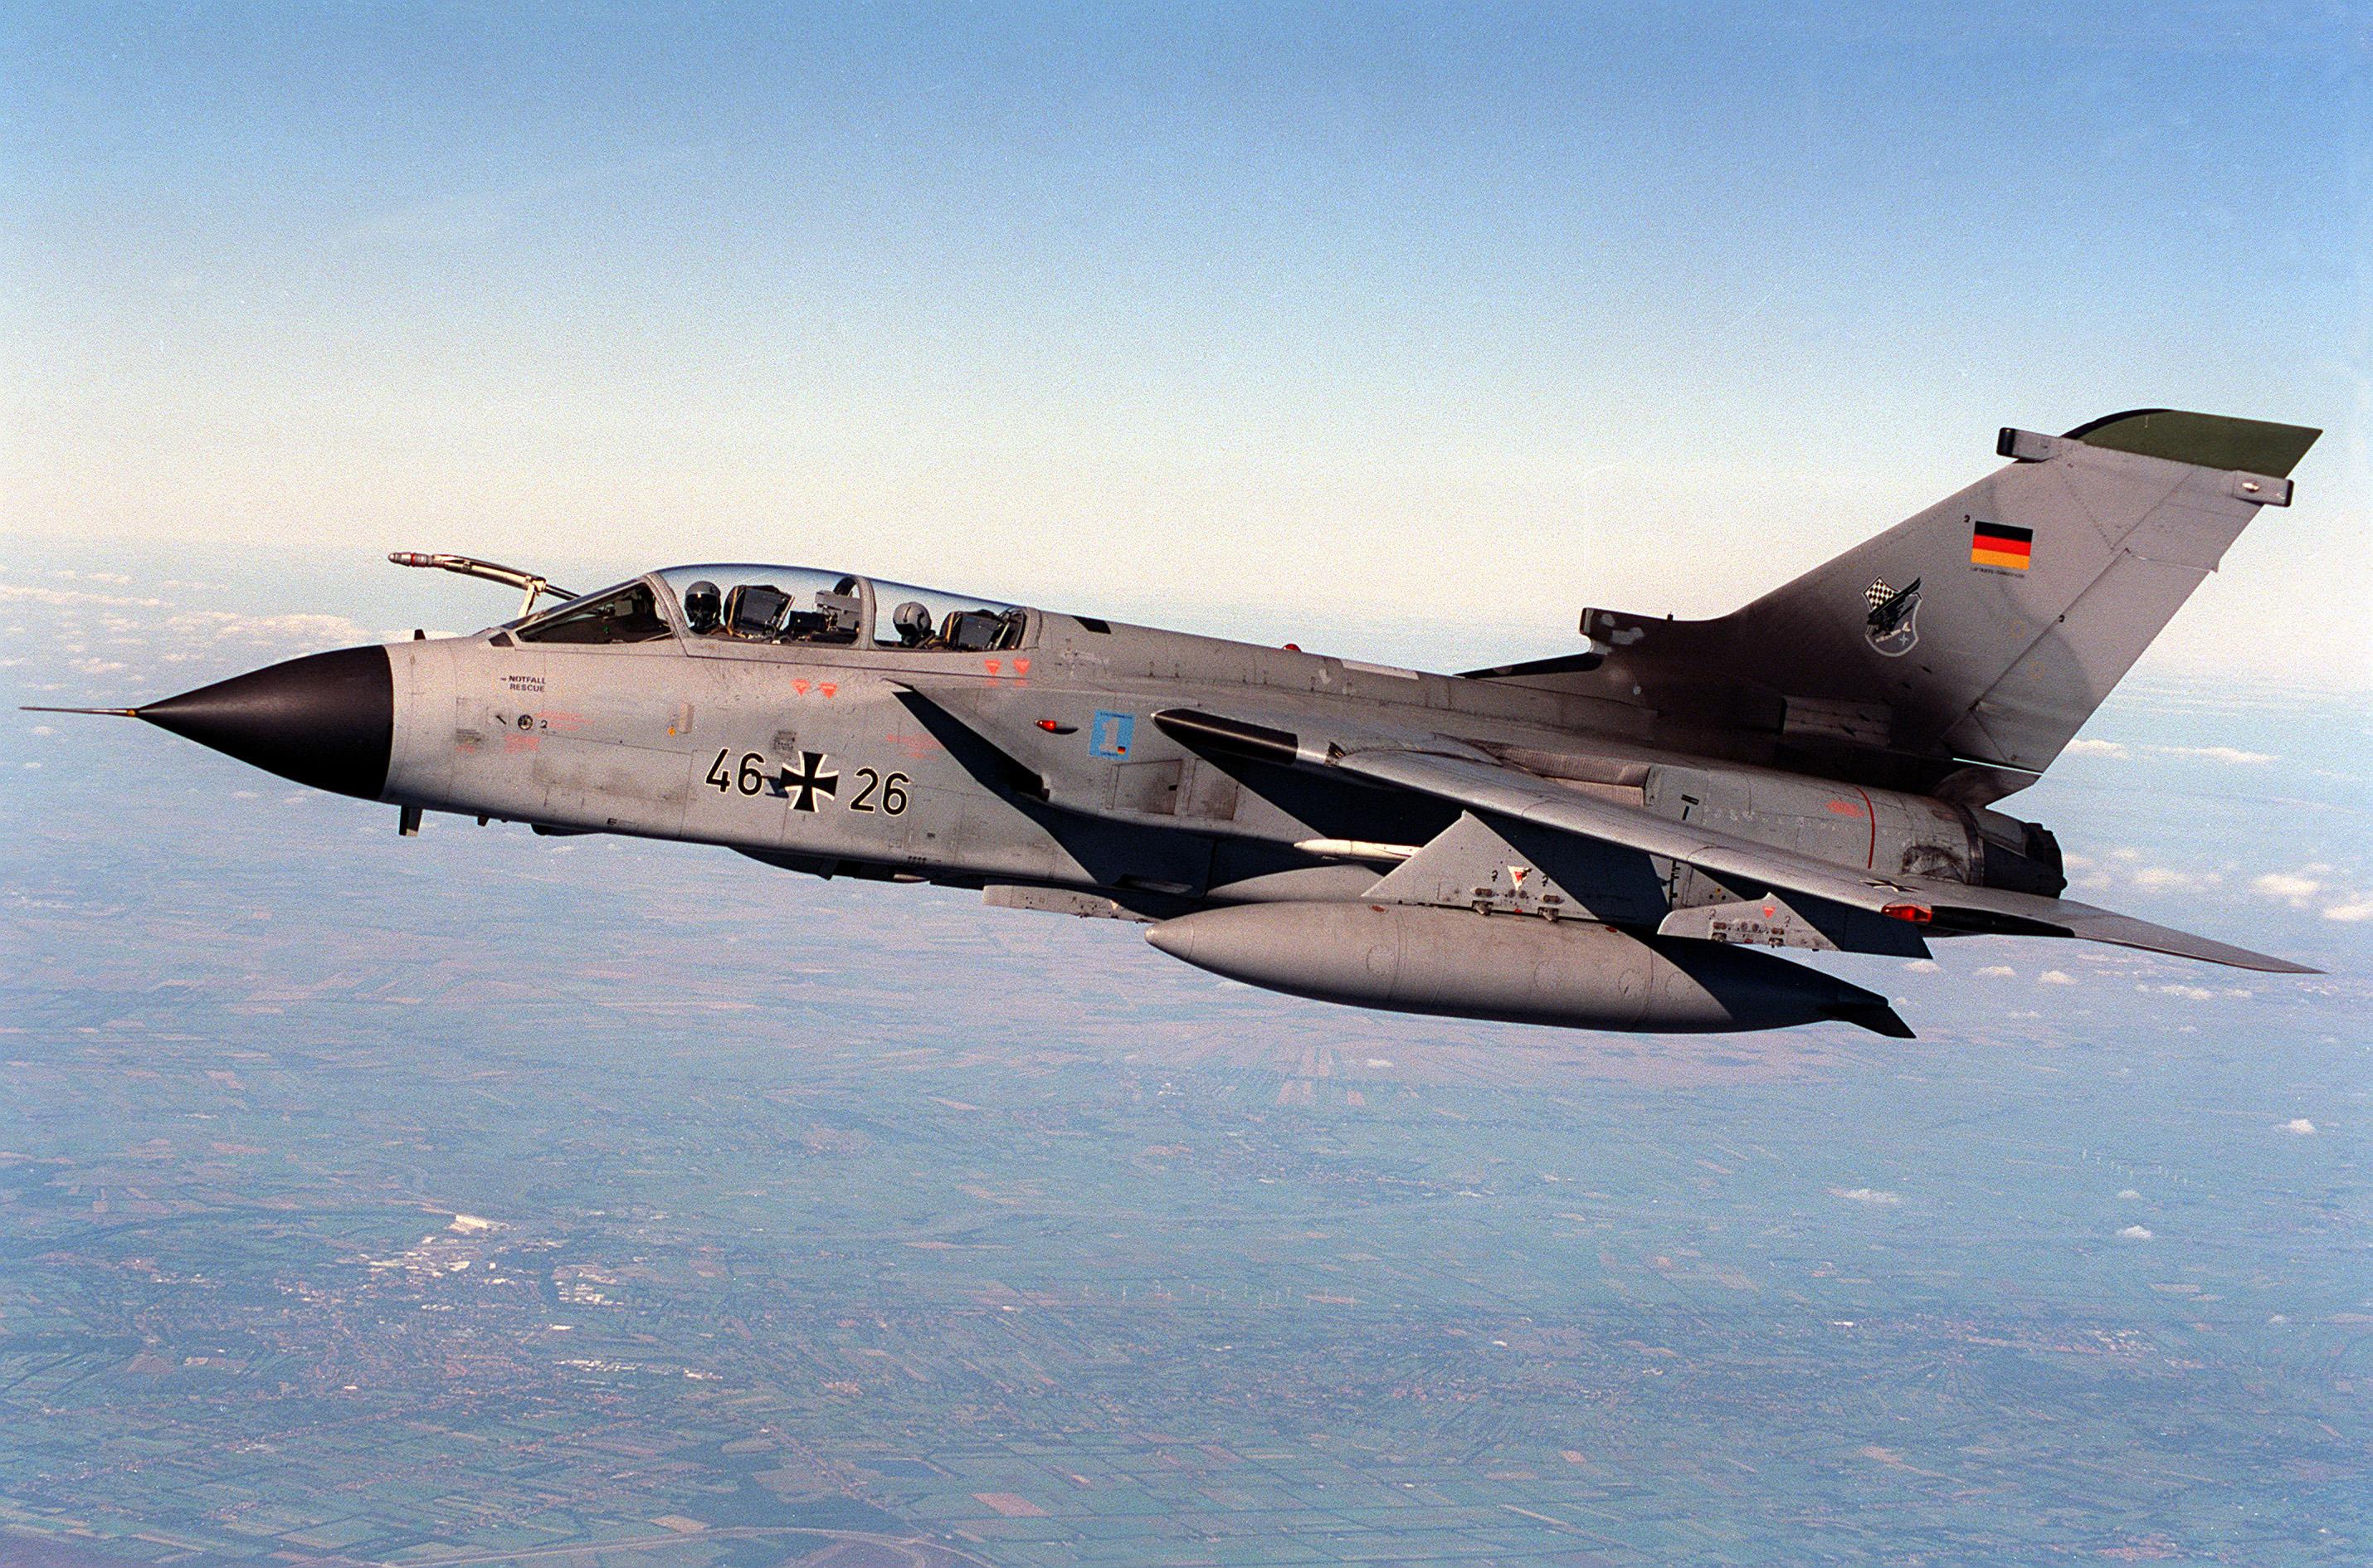 File:Tornado ECR JaBoG 32 1997.JPEG - Wikimedia Commons